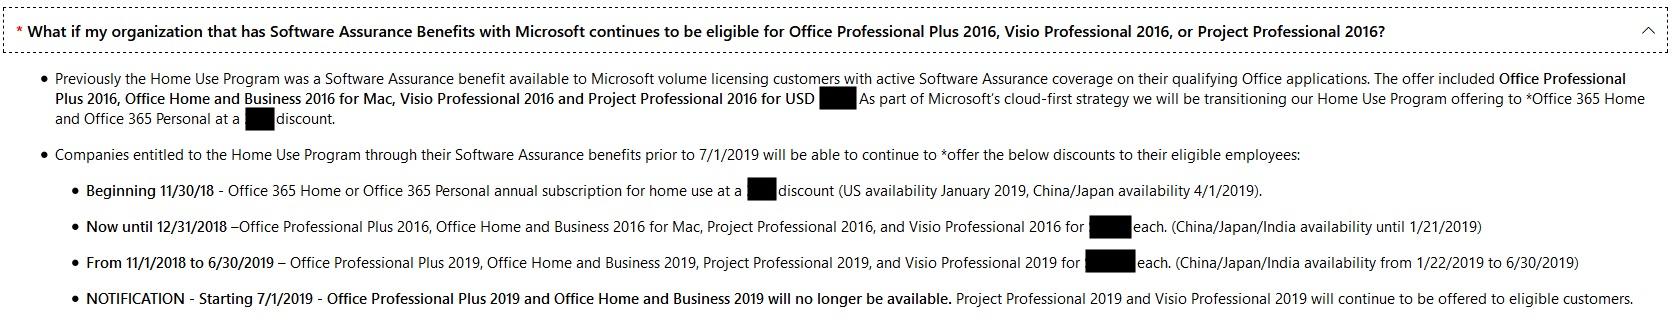 Microsoft home use program office 365 | Microsoft Office Home Use